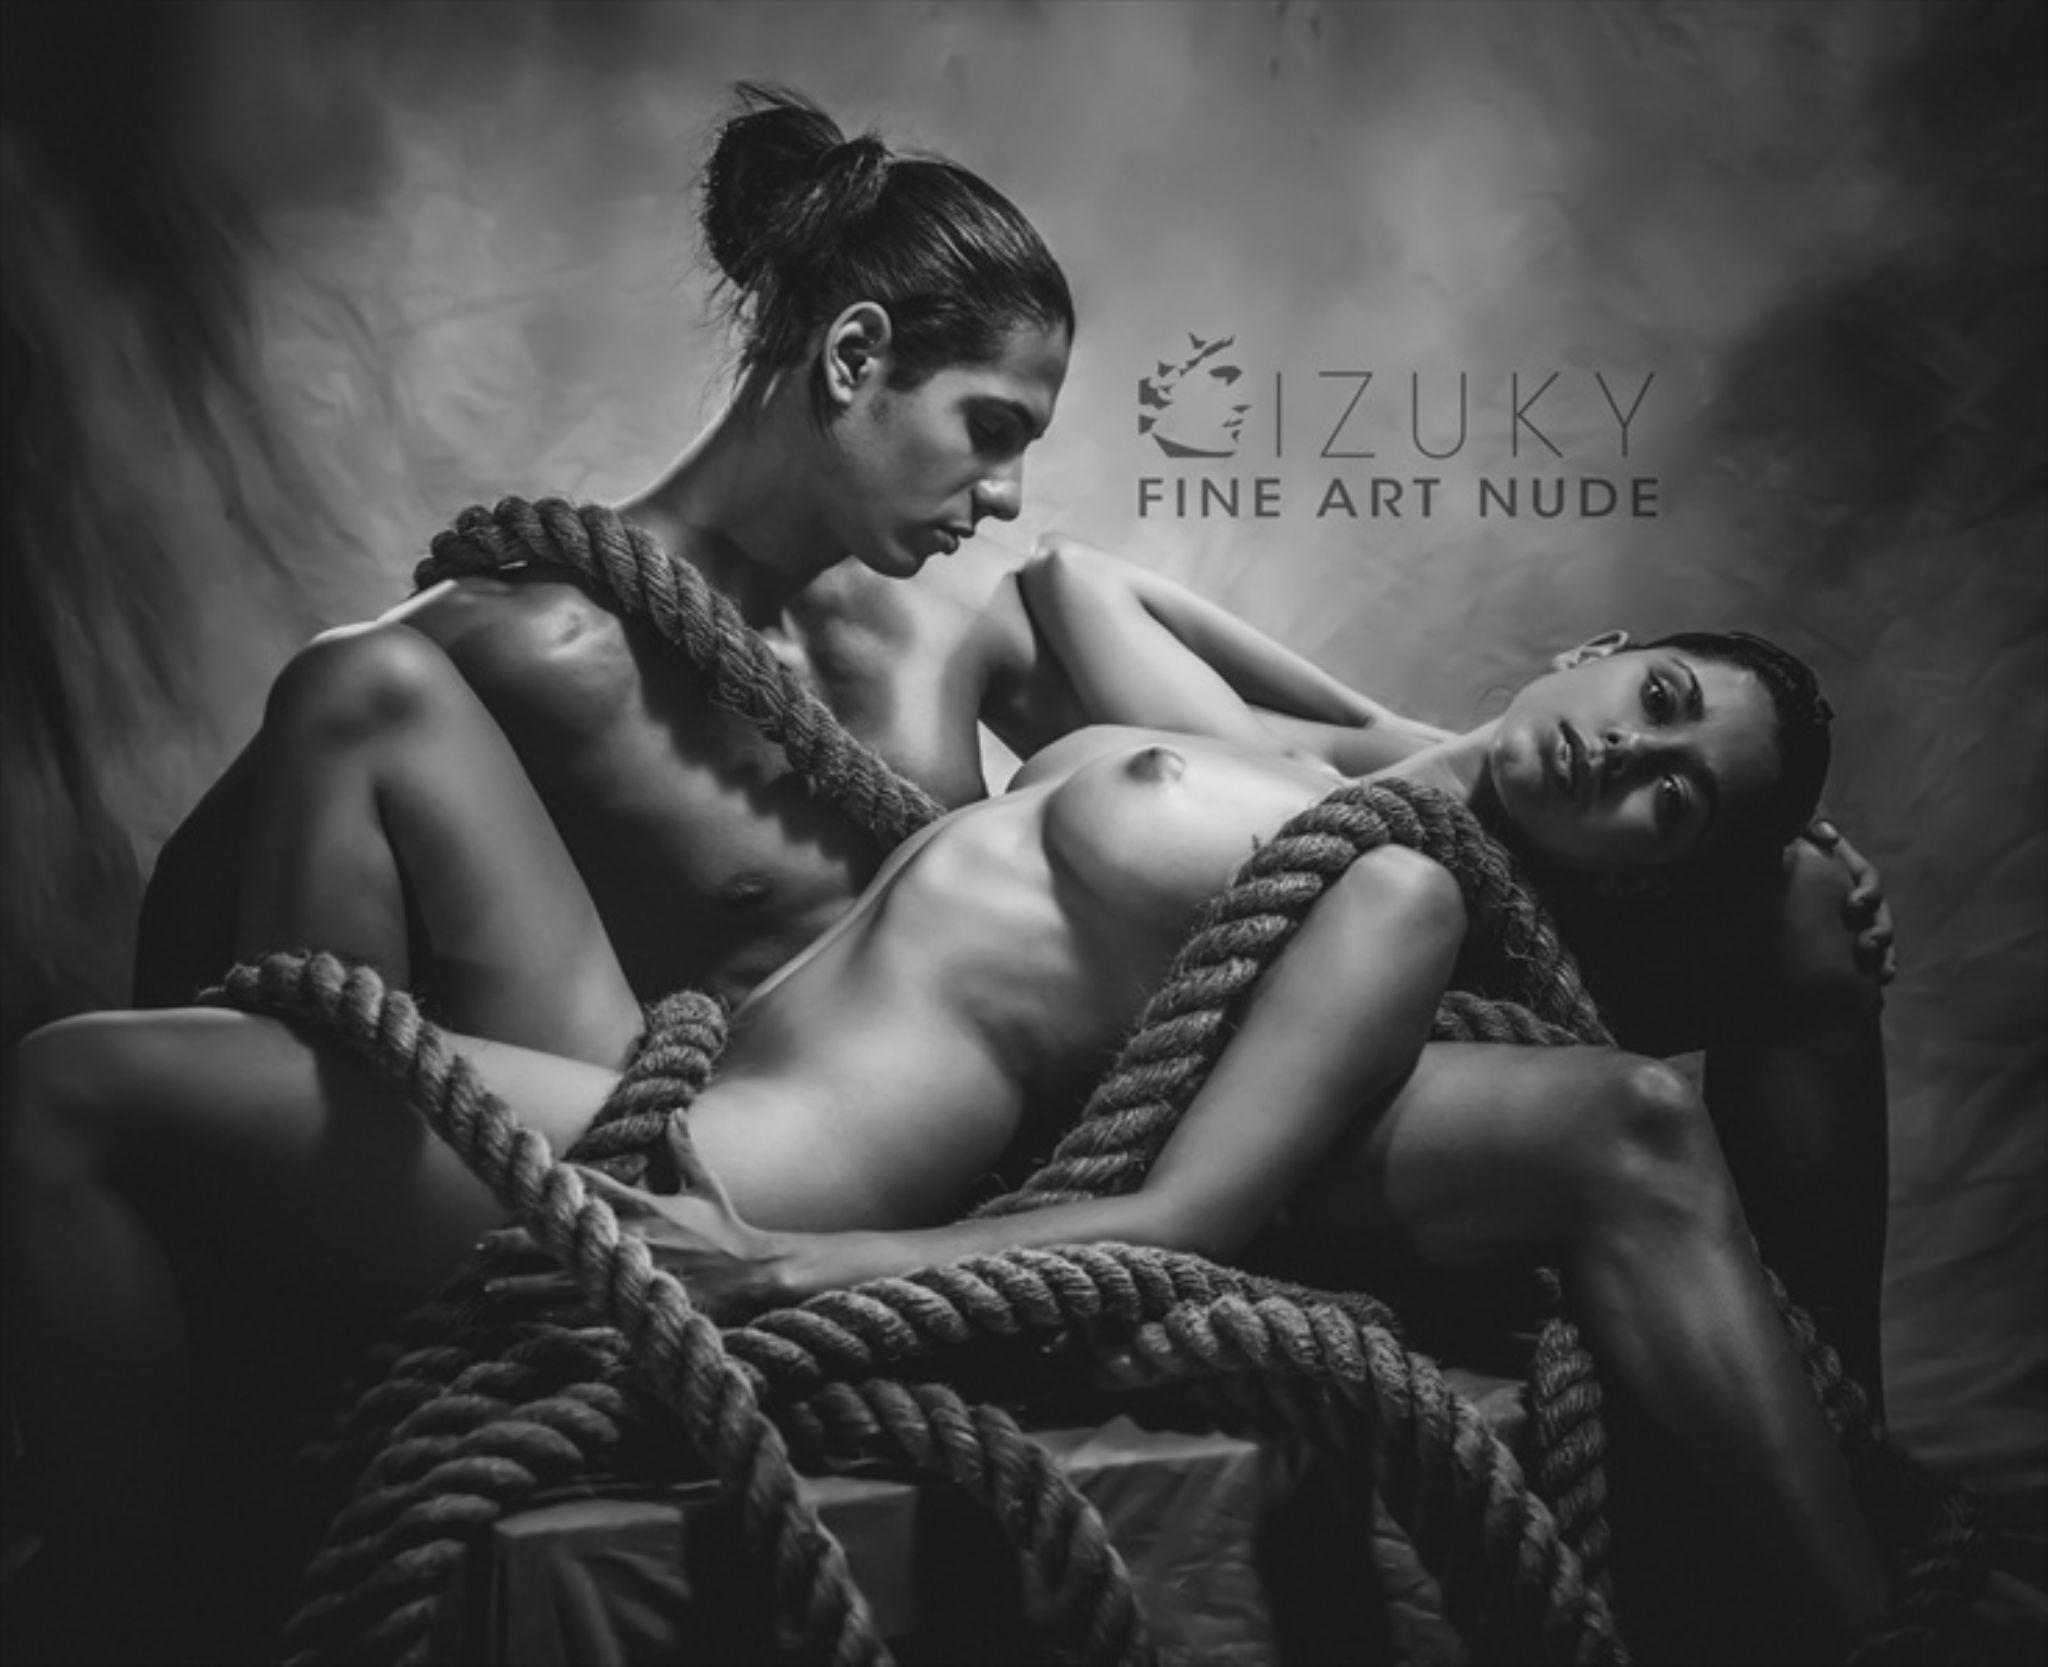 FINE ART NUDE by IzukyStudio